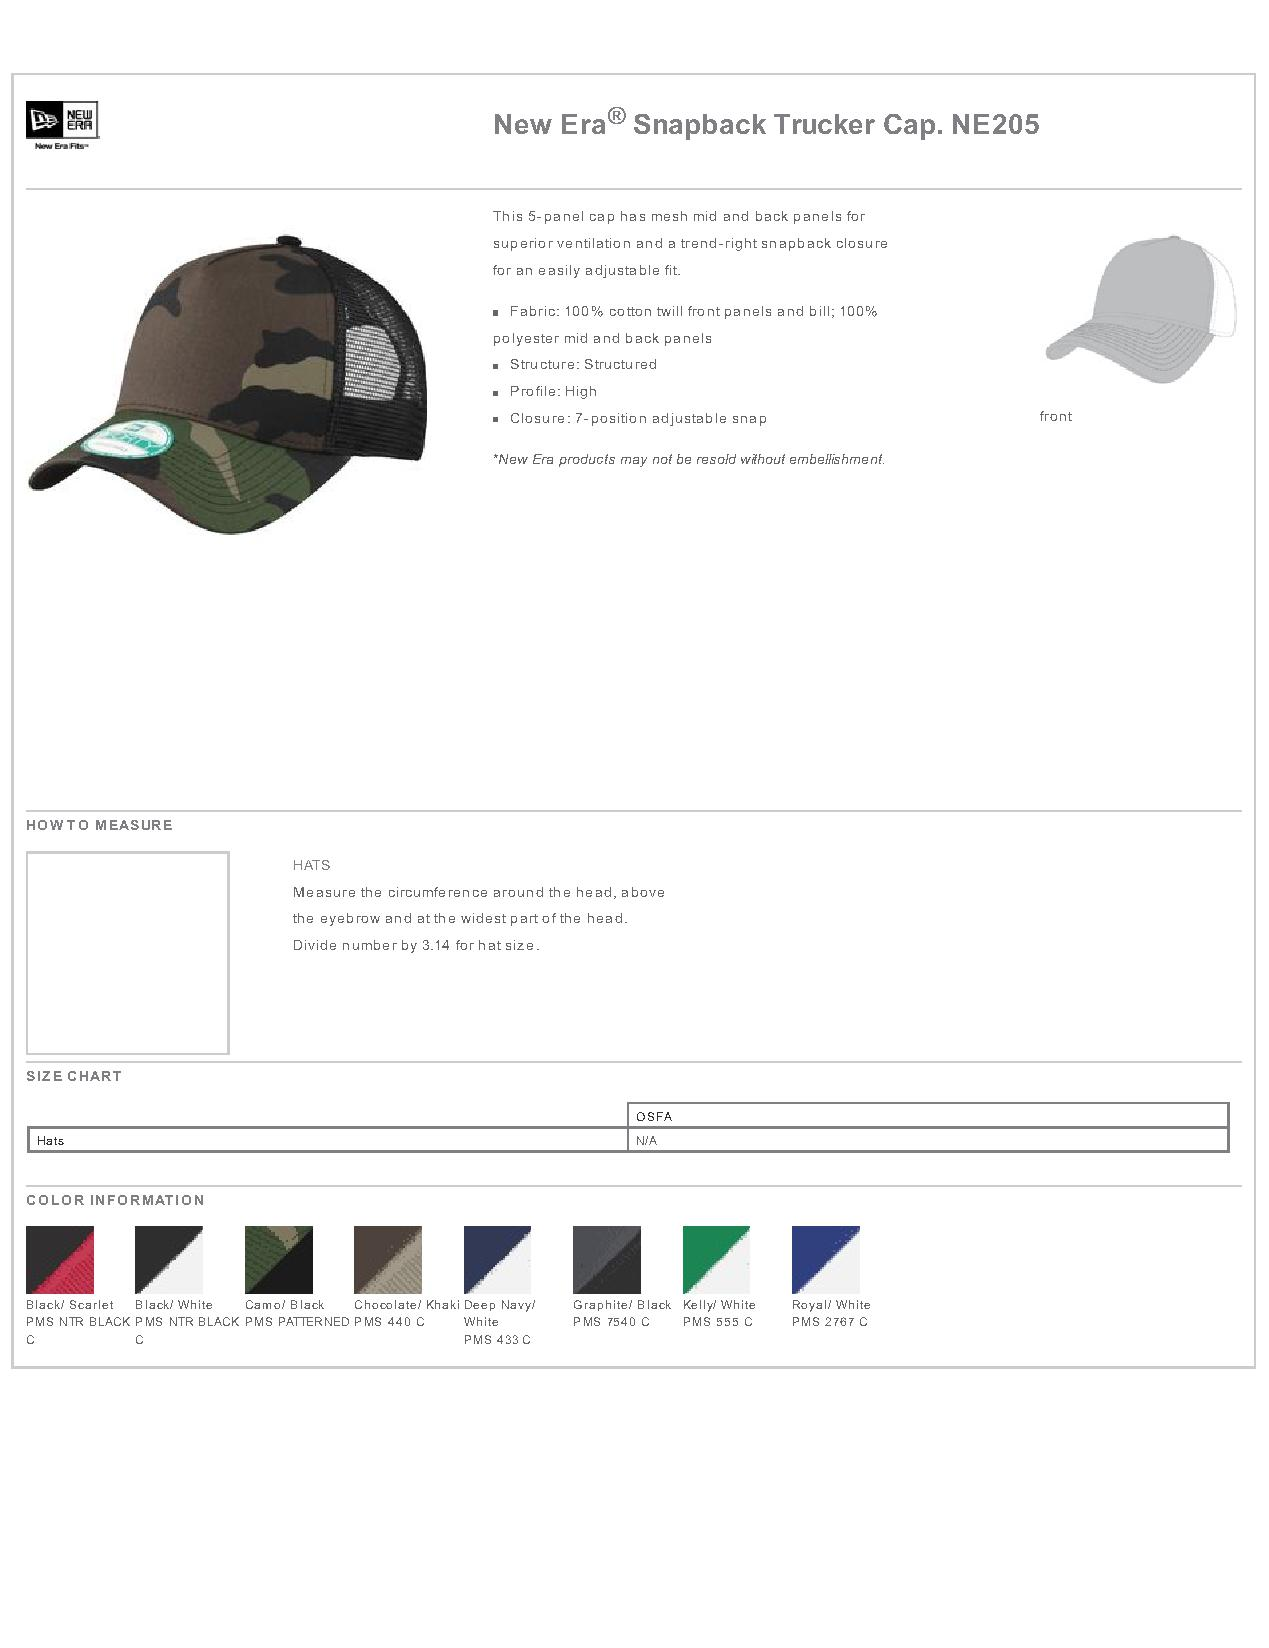 ac37b81d1ce New Era® NE205 - Snapback Trucker Cap - Headwear